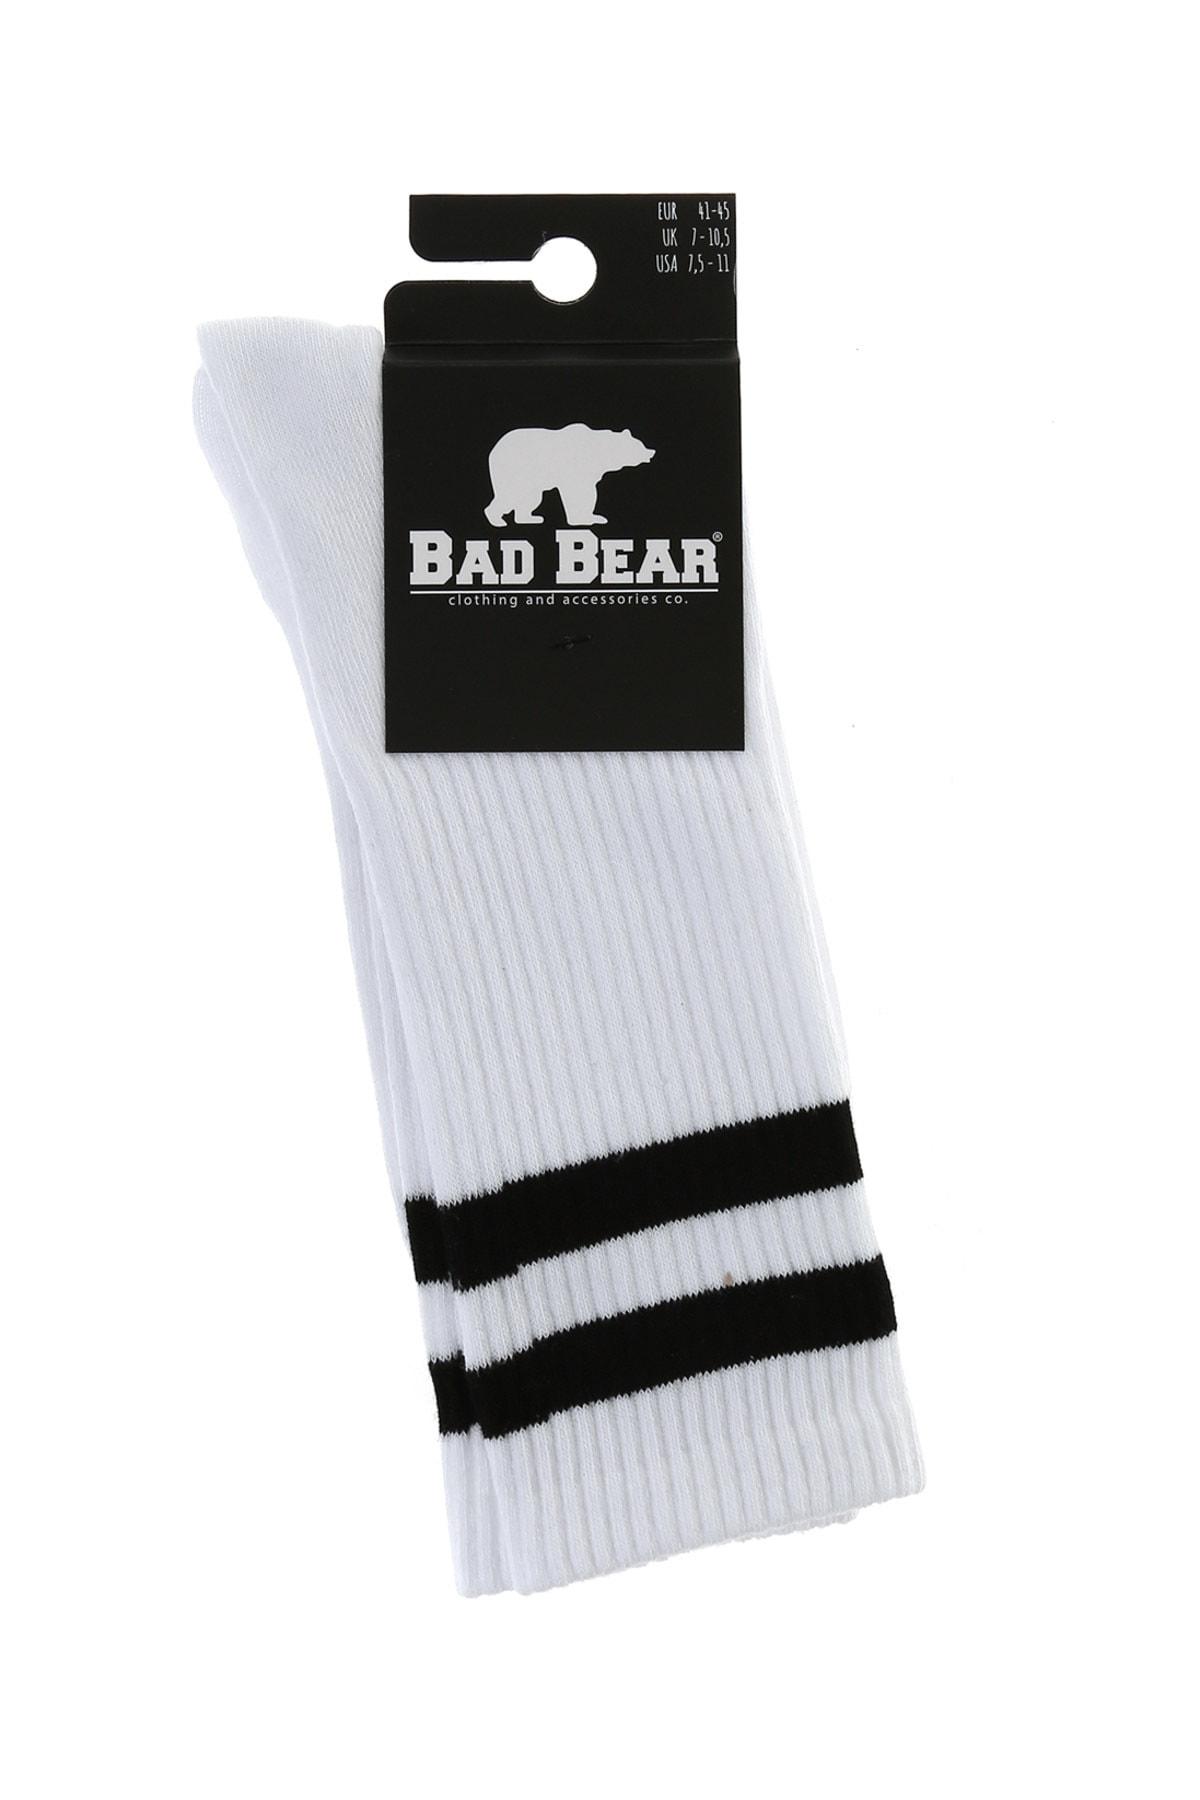 Bad Bear BENCH TALL WHITE-NIGHT 1